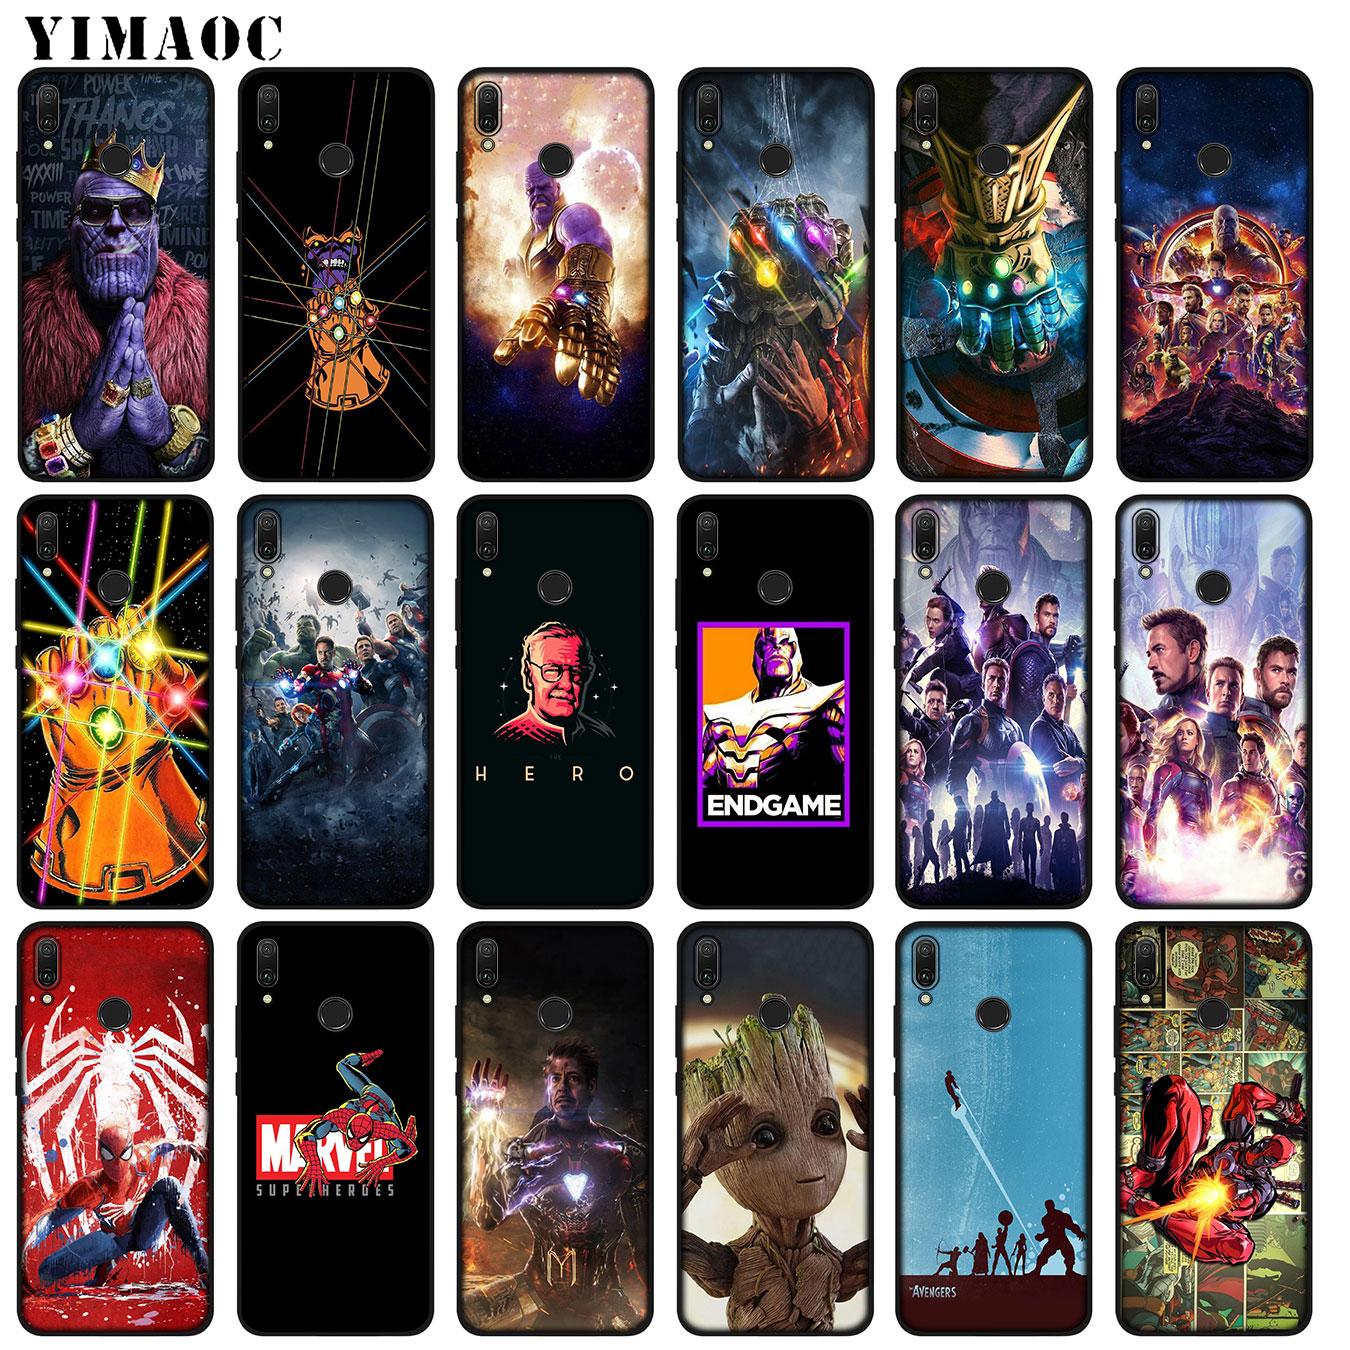 the-font-b-avengers-b-font-thanos-marvel-endgame-soft-silicone-case-for-huawei-p30-p20-pro-p10-p9-p8-lite-mini-2017-2016-2015-p-smart-2019